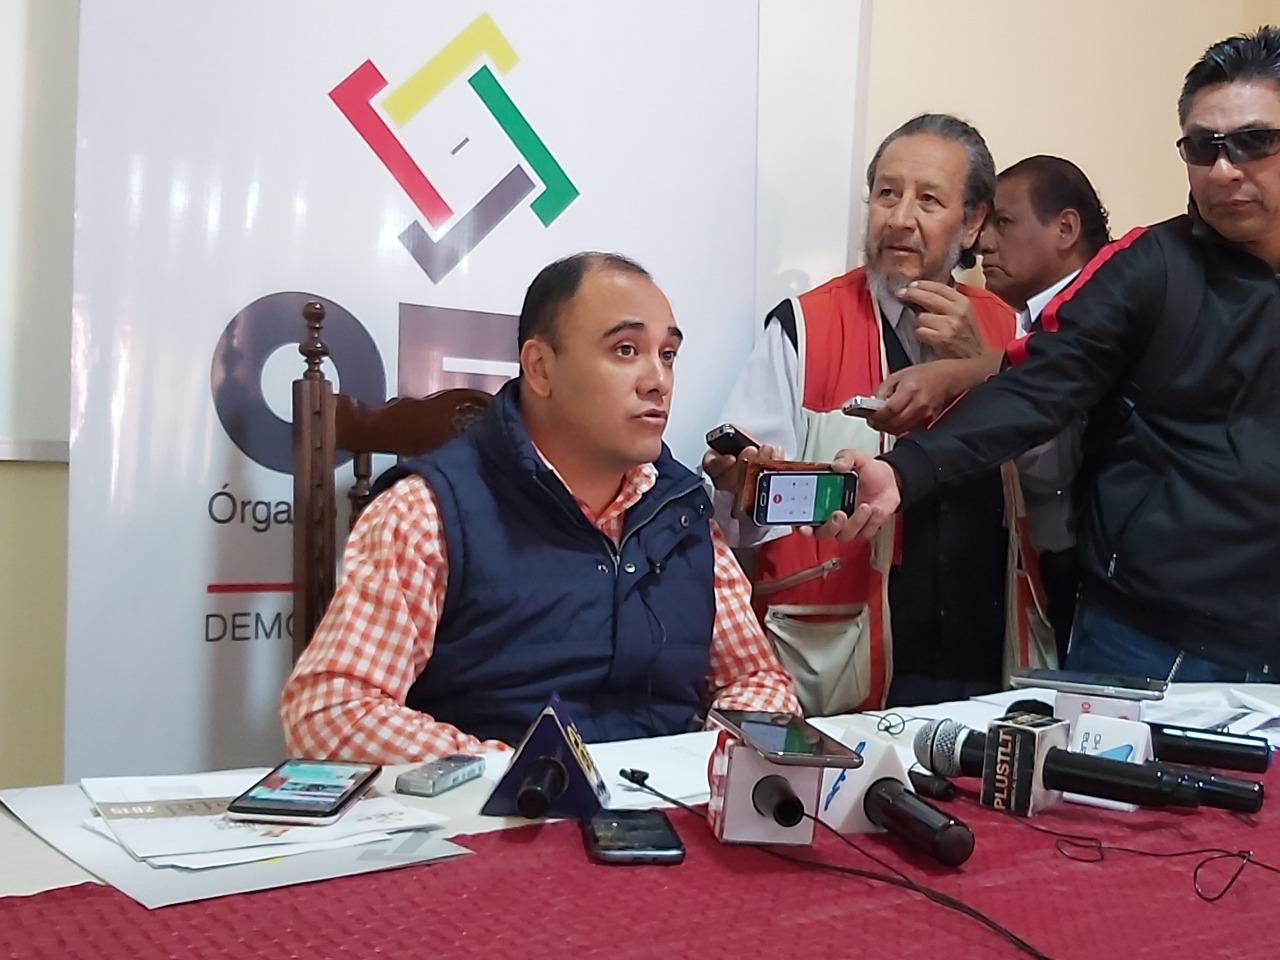 Tarija ocupa el quinto lugar del padrón electoral a nivel nacional